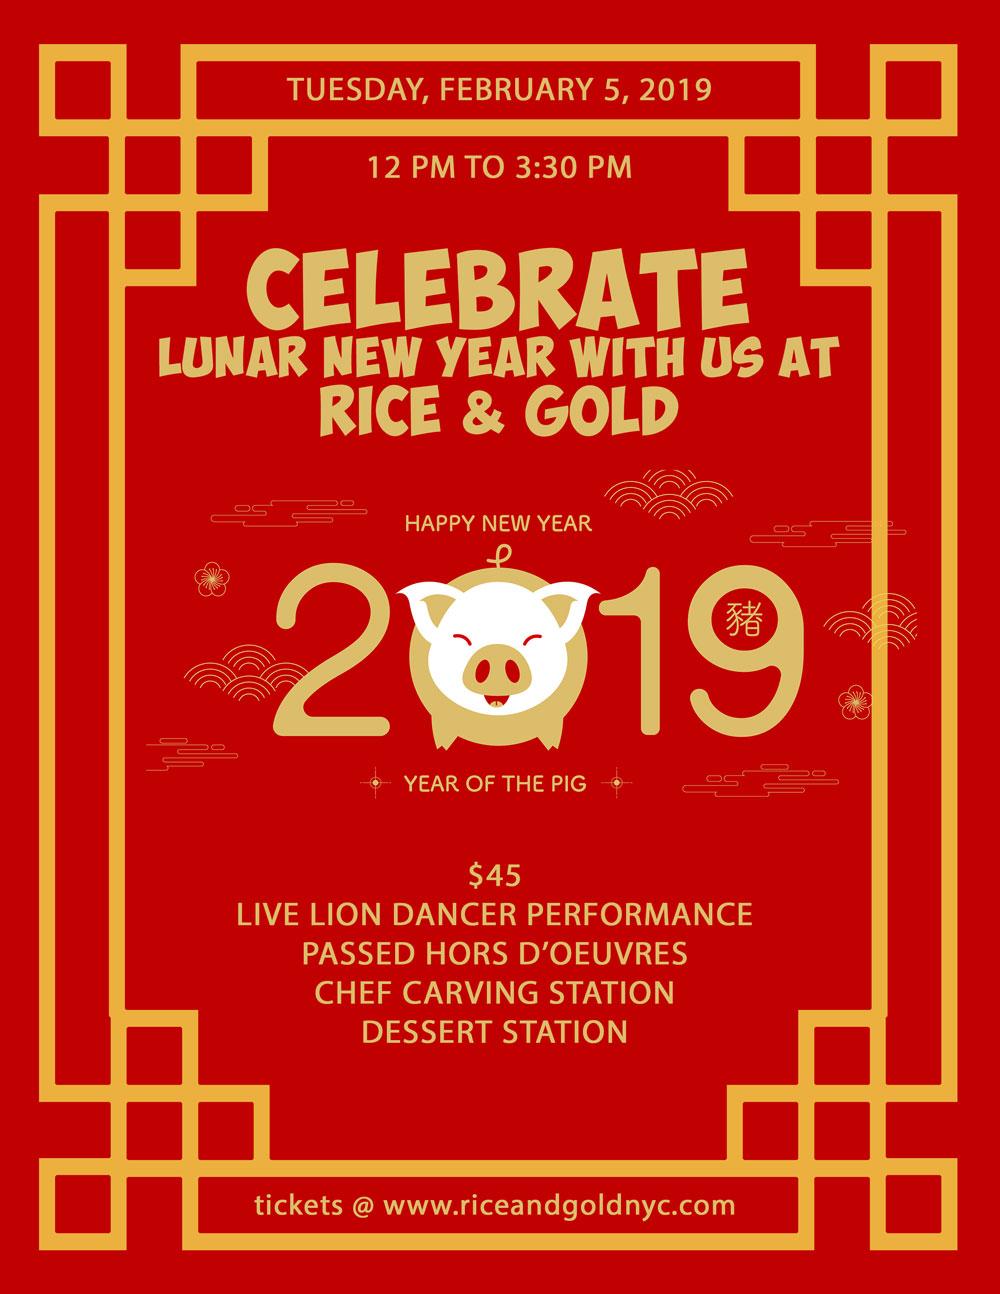 Lunar New Year 2019 Rice & Gold